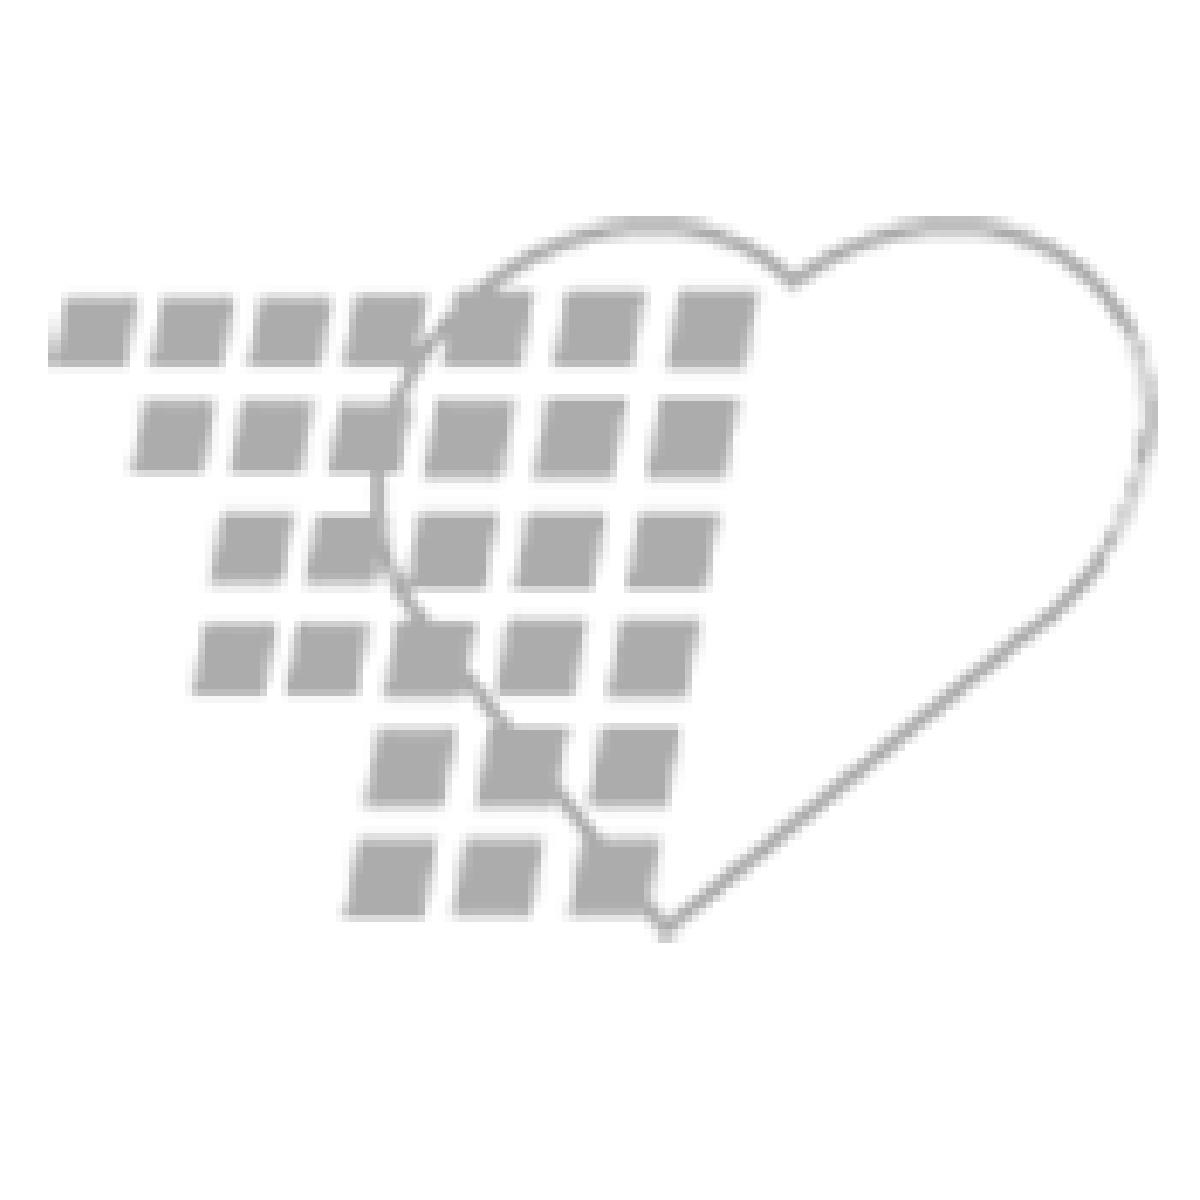 06-93-6104 Demo Dose® Simulated FFP AB Rh Positive